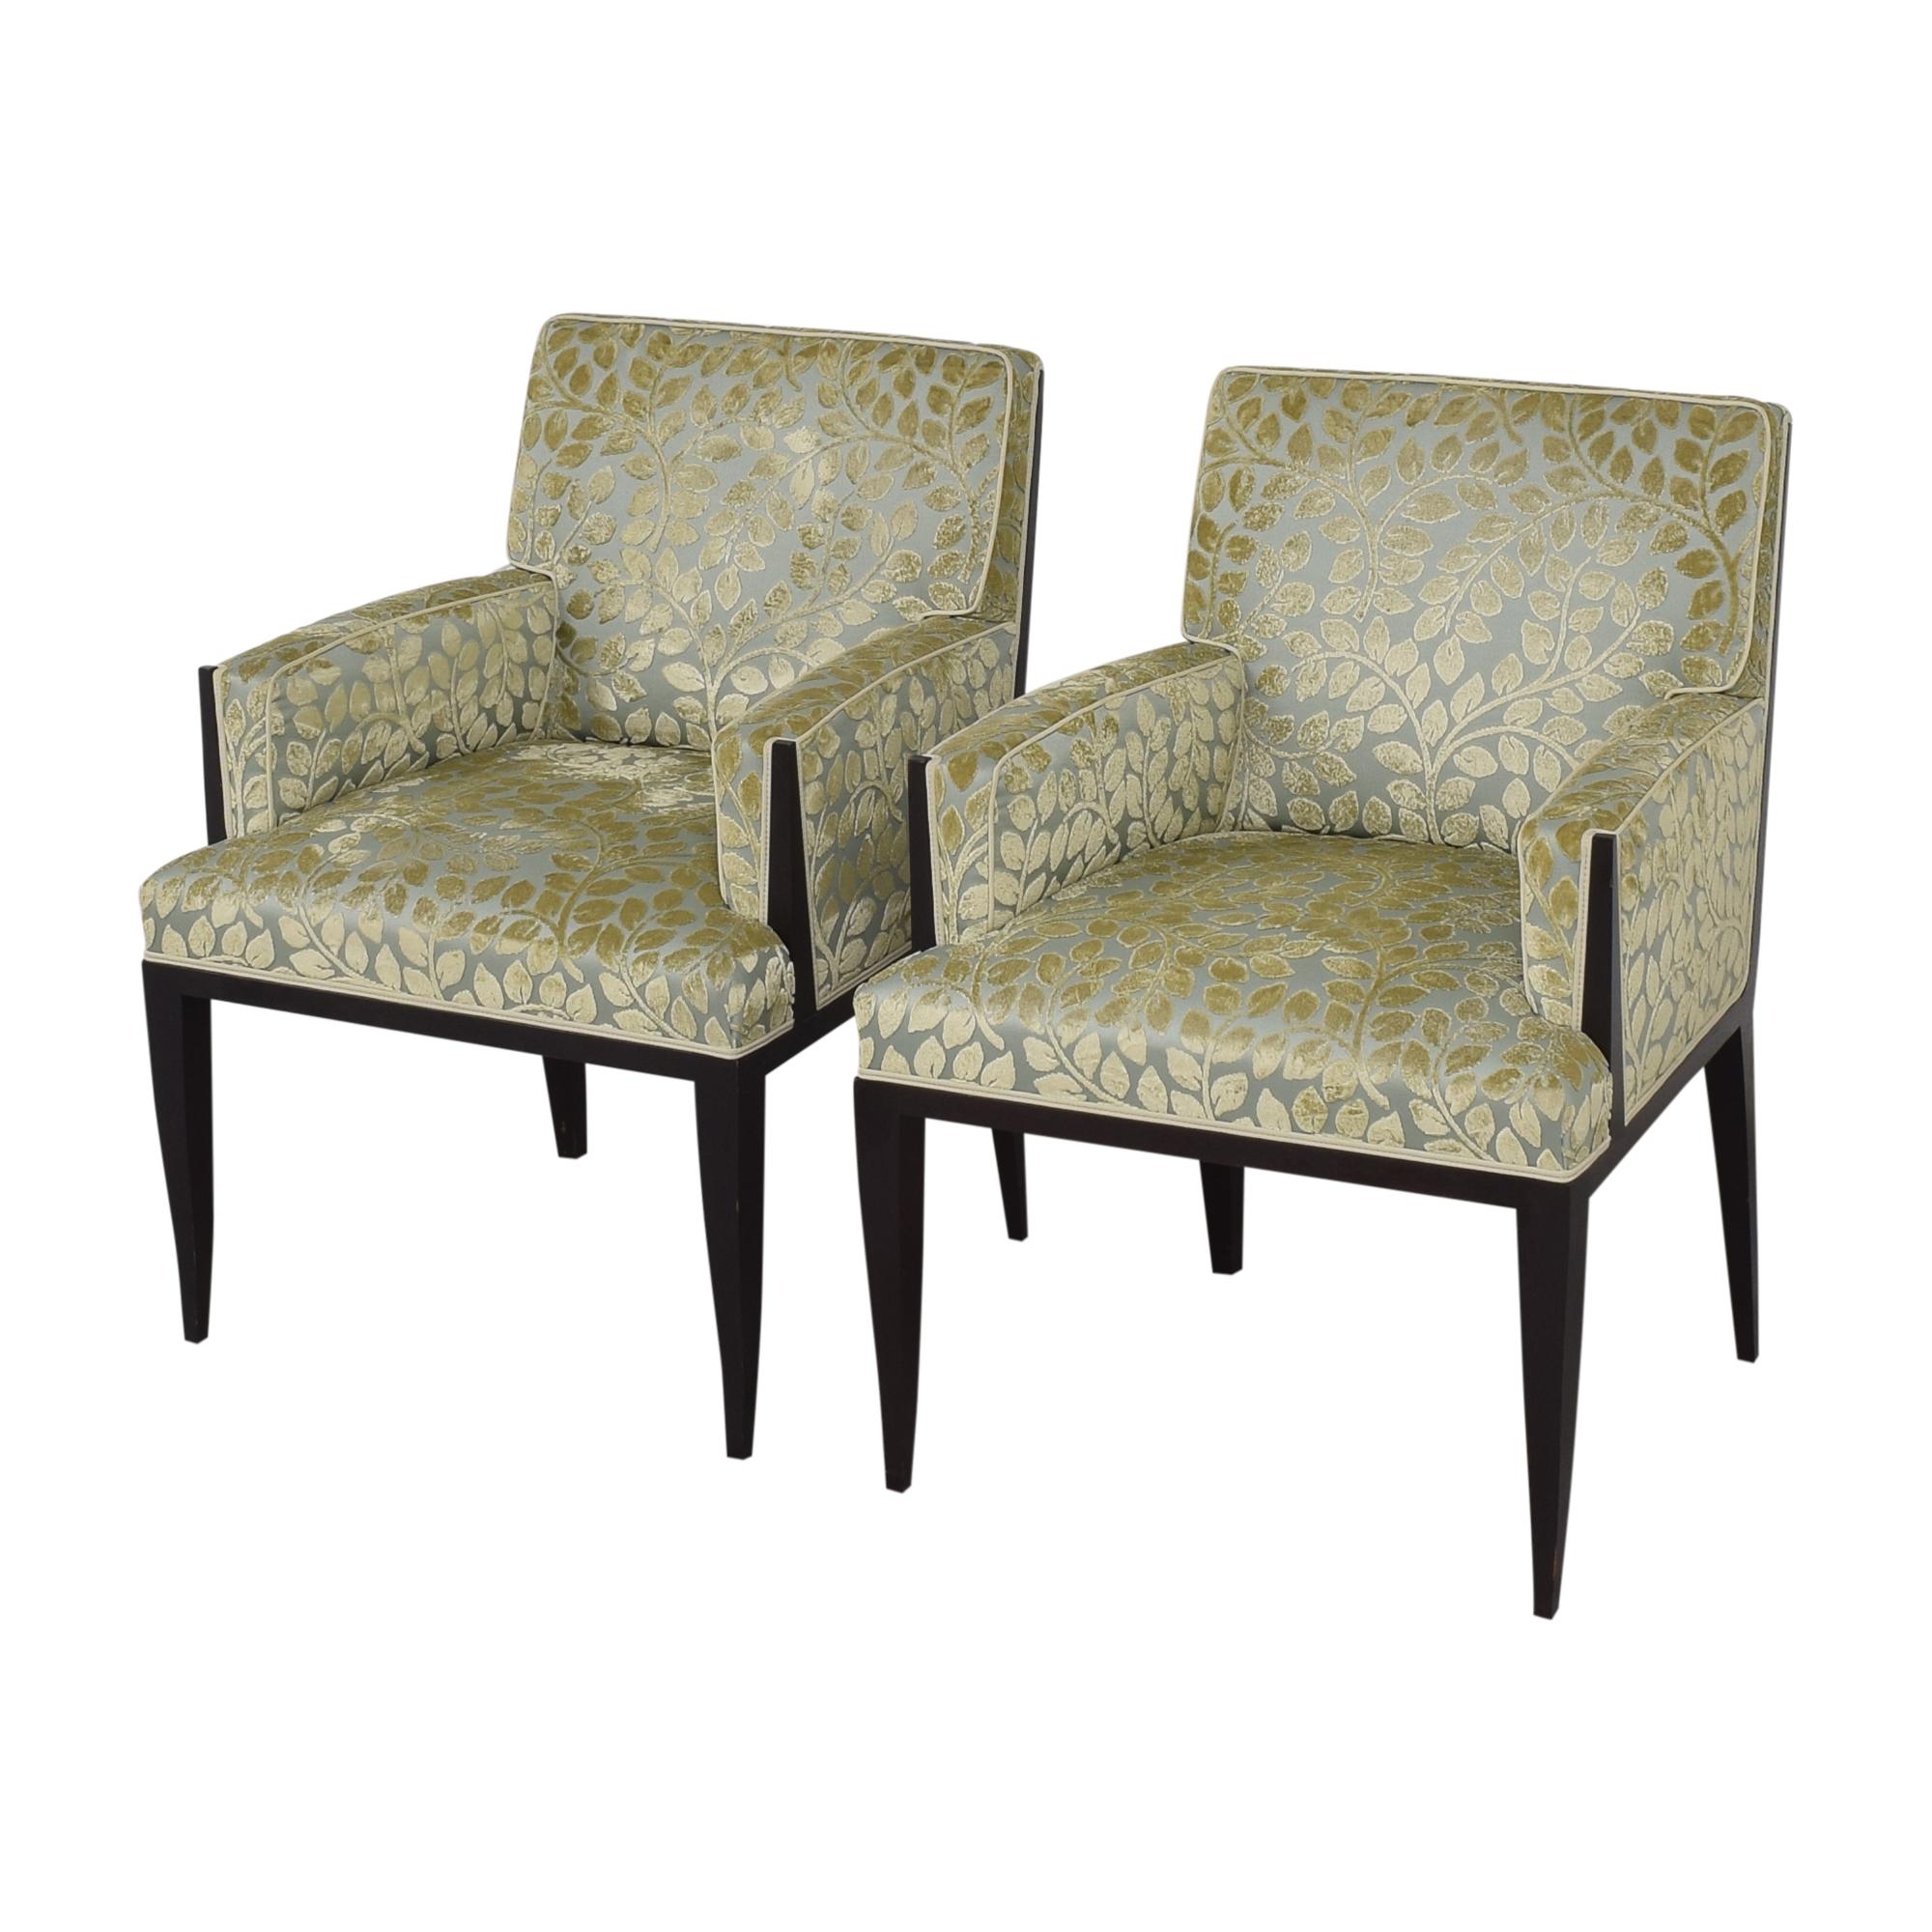 Mattaliano Mattaliano Flea Market #1 Dining Arm Chairs ct